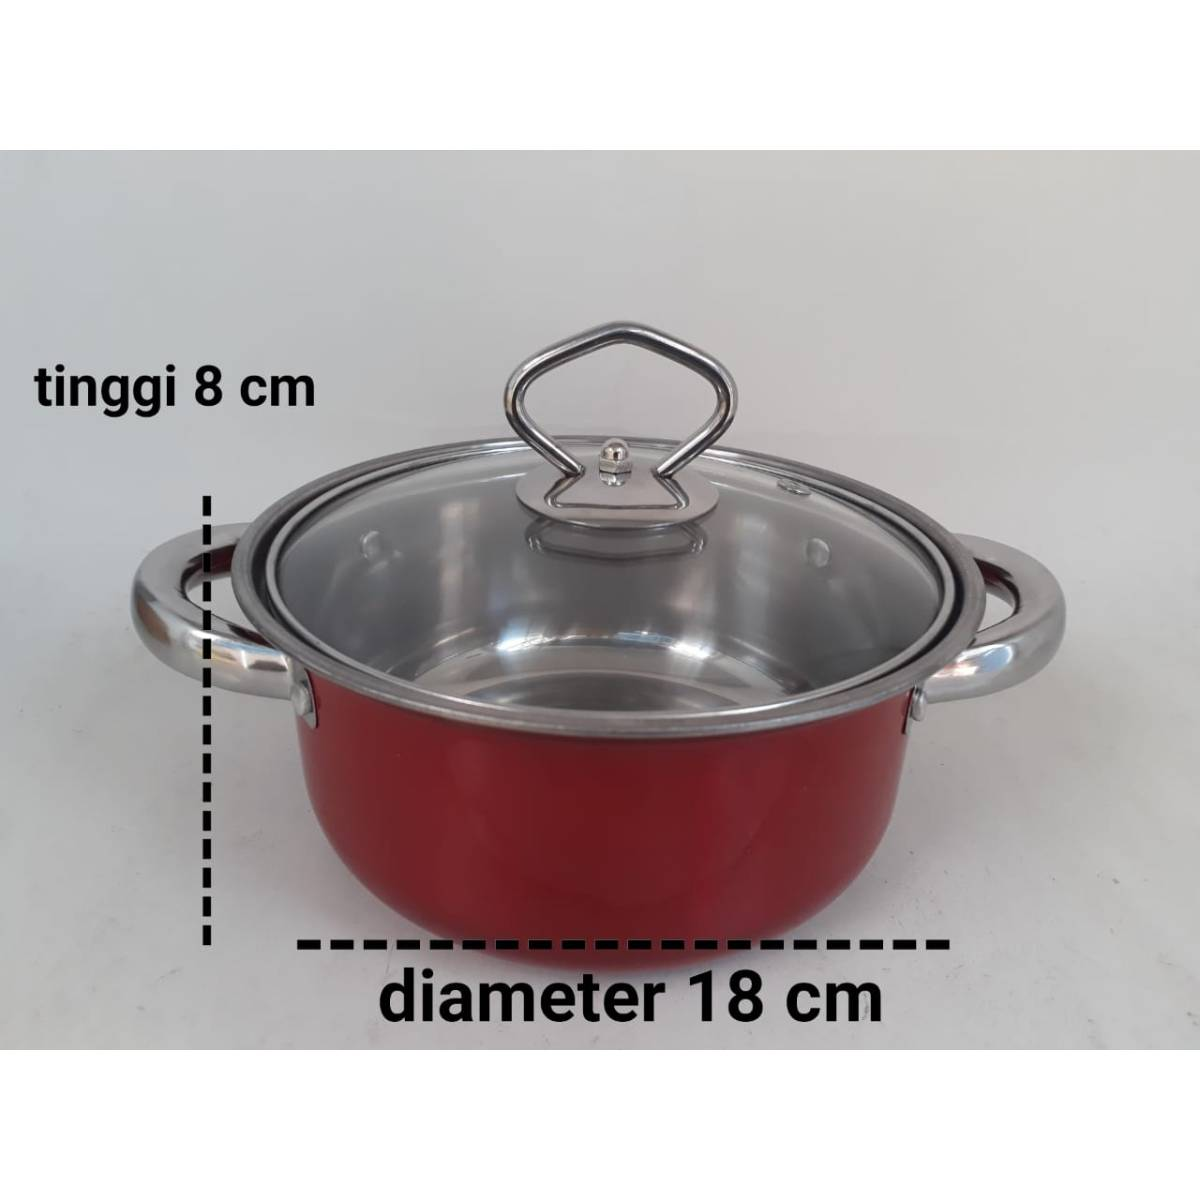 Vcp (variant Cooking Pan) (12 Set) (s-234)4